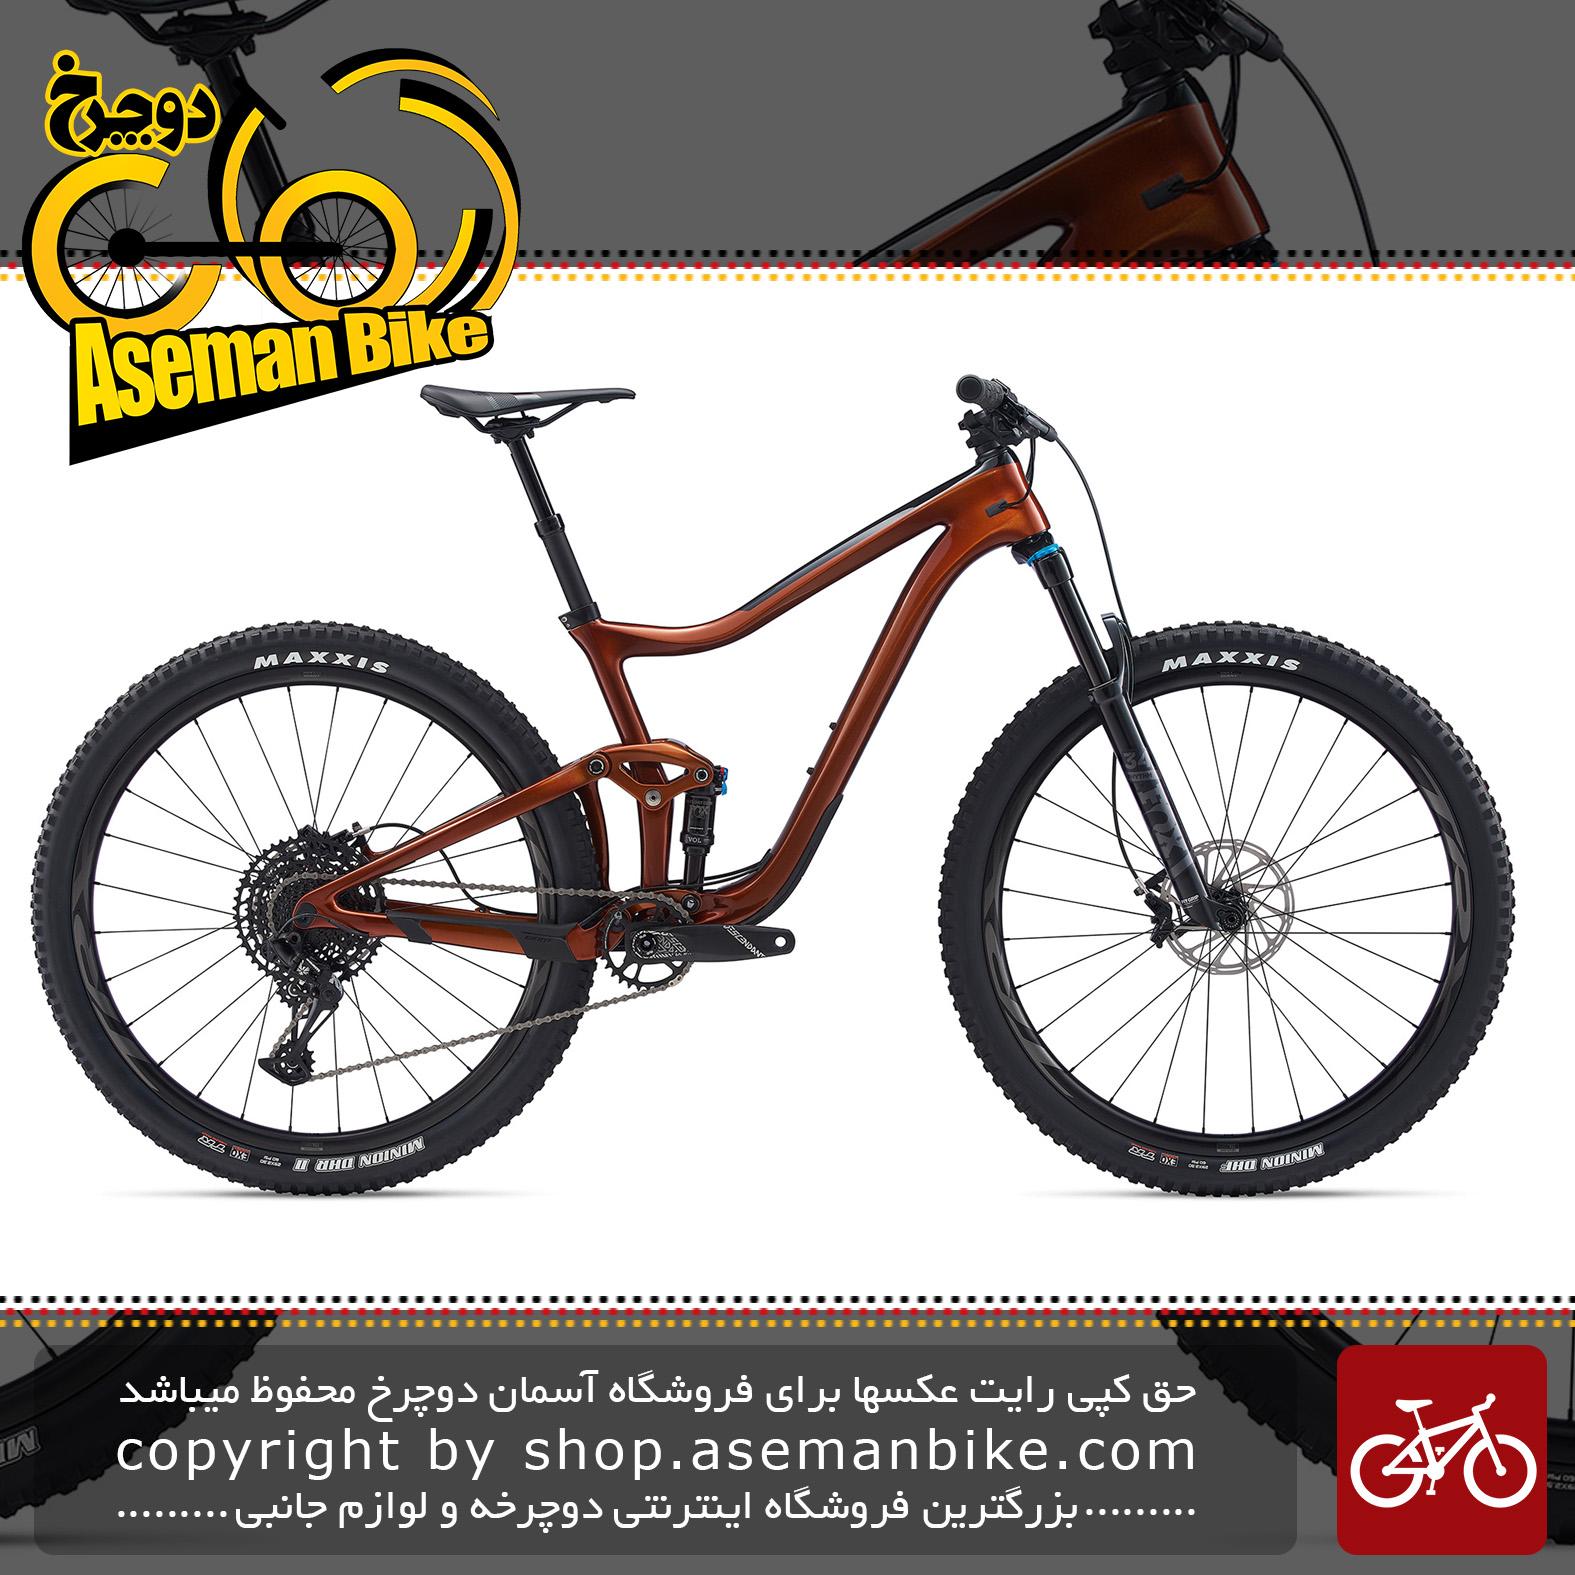 دوچرخه کوهستان جاینت مدل ترنس ادونس پرو 29 2 2020 Giant Mountain Bicycle Trance Advanced Pro 29 2 2020